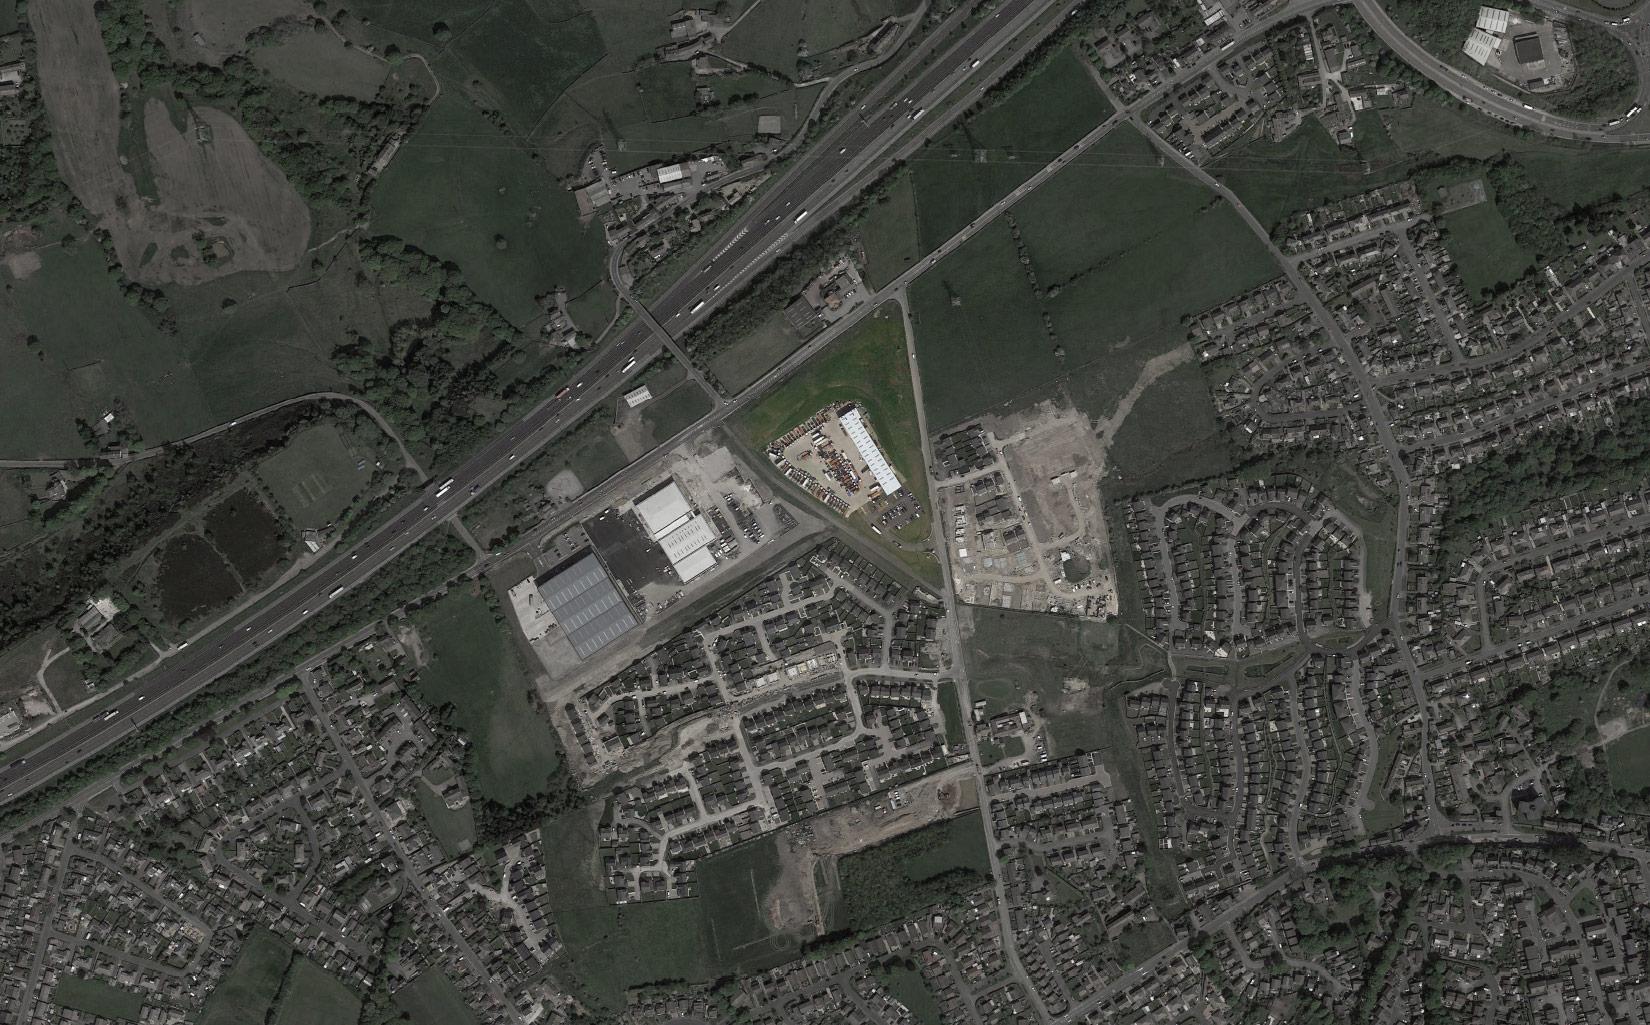 Macs Trucks, Lindley Moor, Huddersfield, Aerial